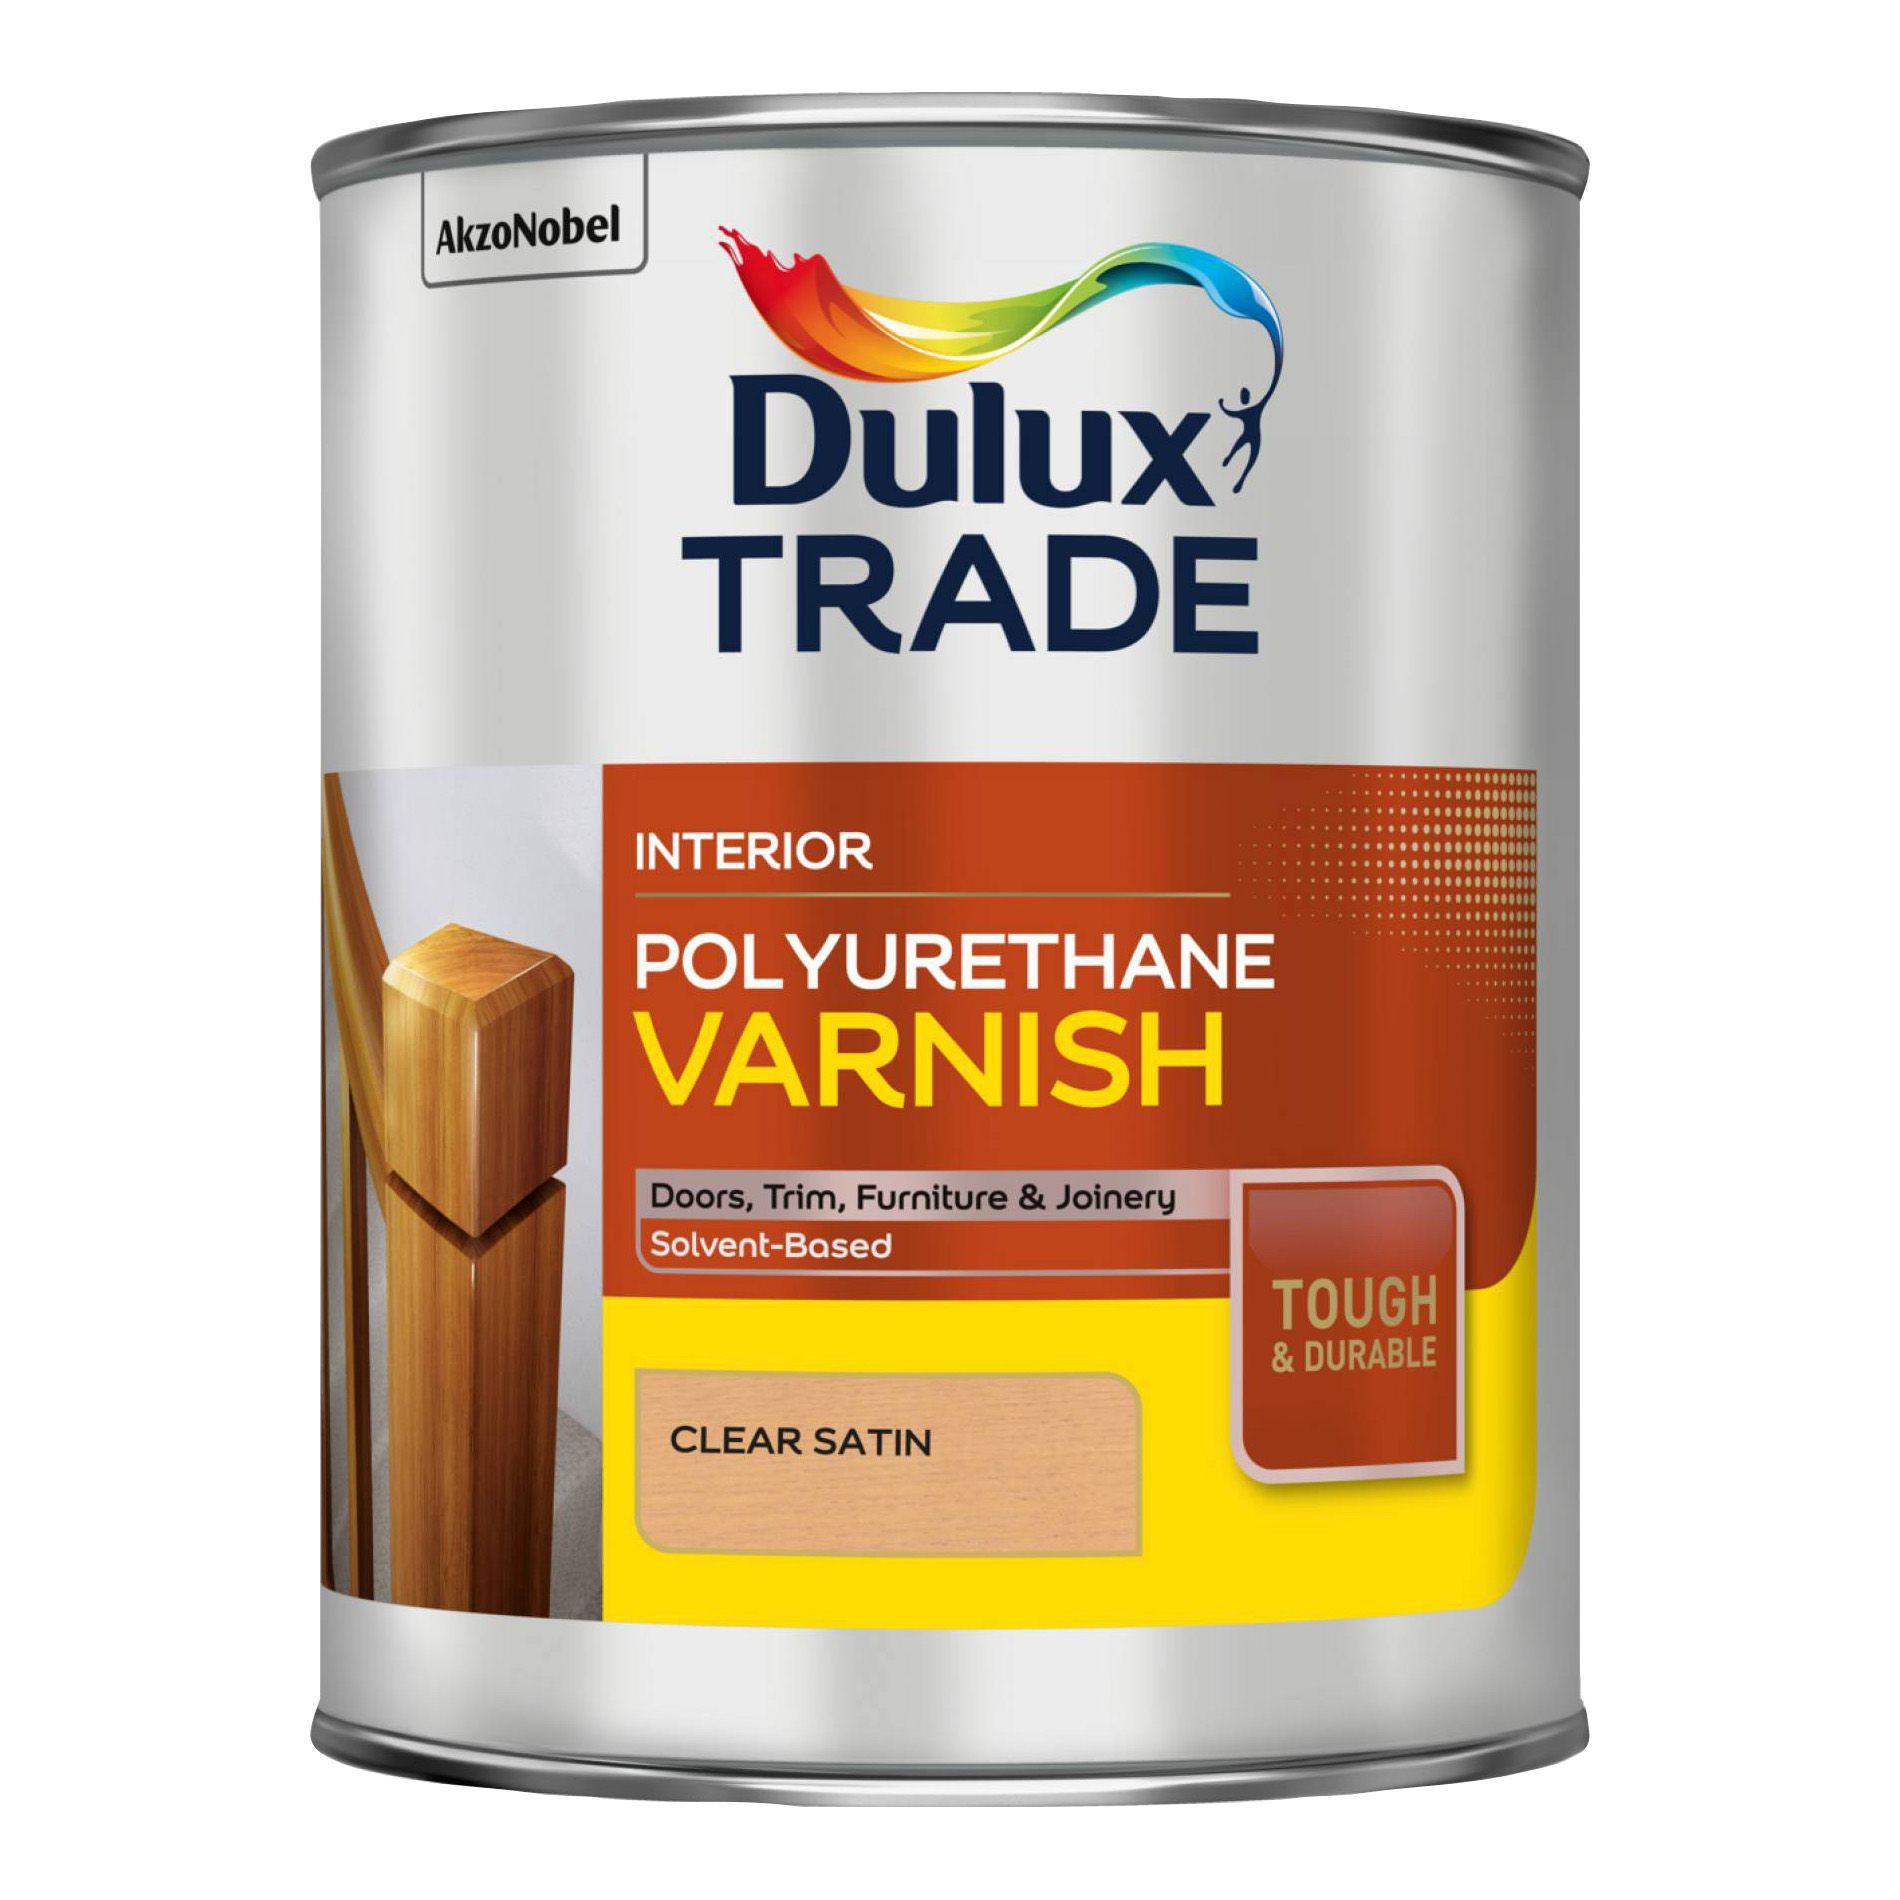 Dulux Trade Clear Satin Varnish 1000ml Tin Departments  : 501021256859003c from www.diy.com size 1900 x 1900 jpeg 209kB